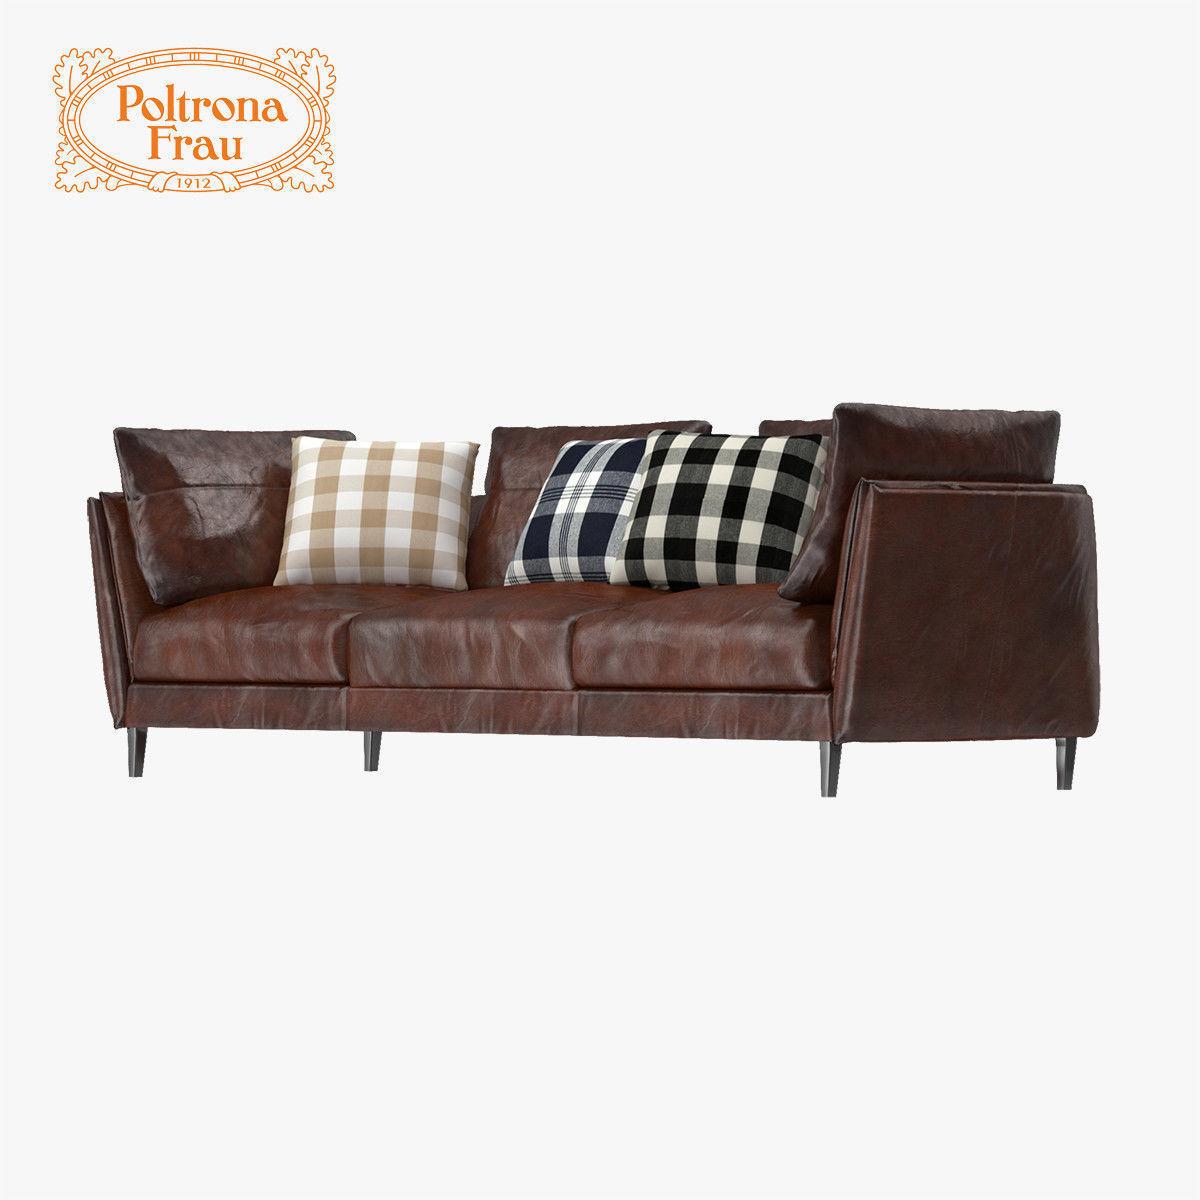 poltrona frau sofa review blue sofas living room bretagne 3d model max obj fbx mtl cgtrader